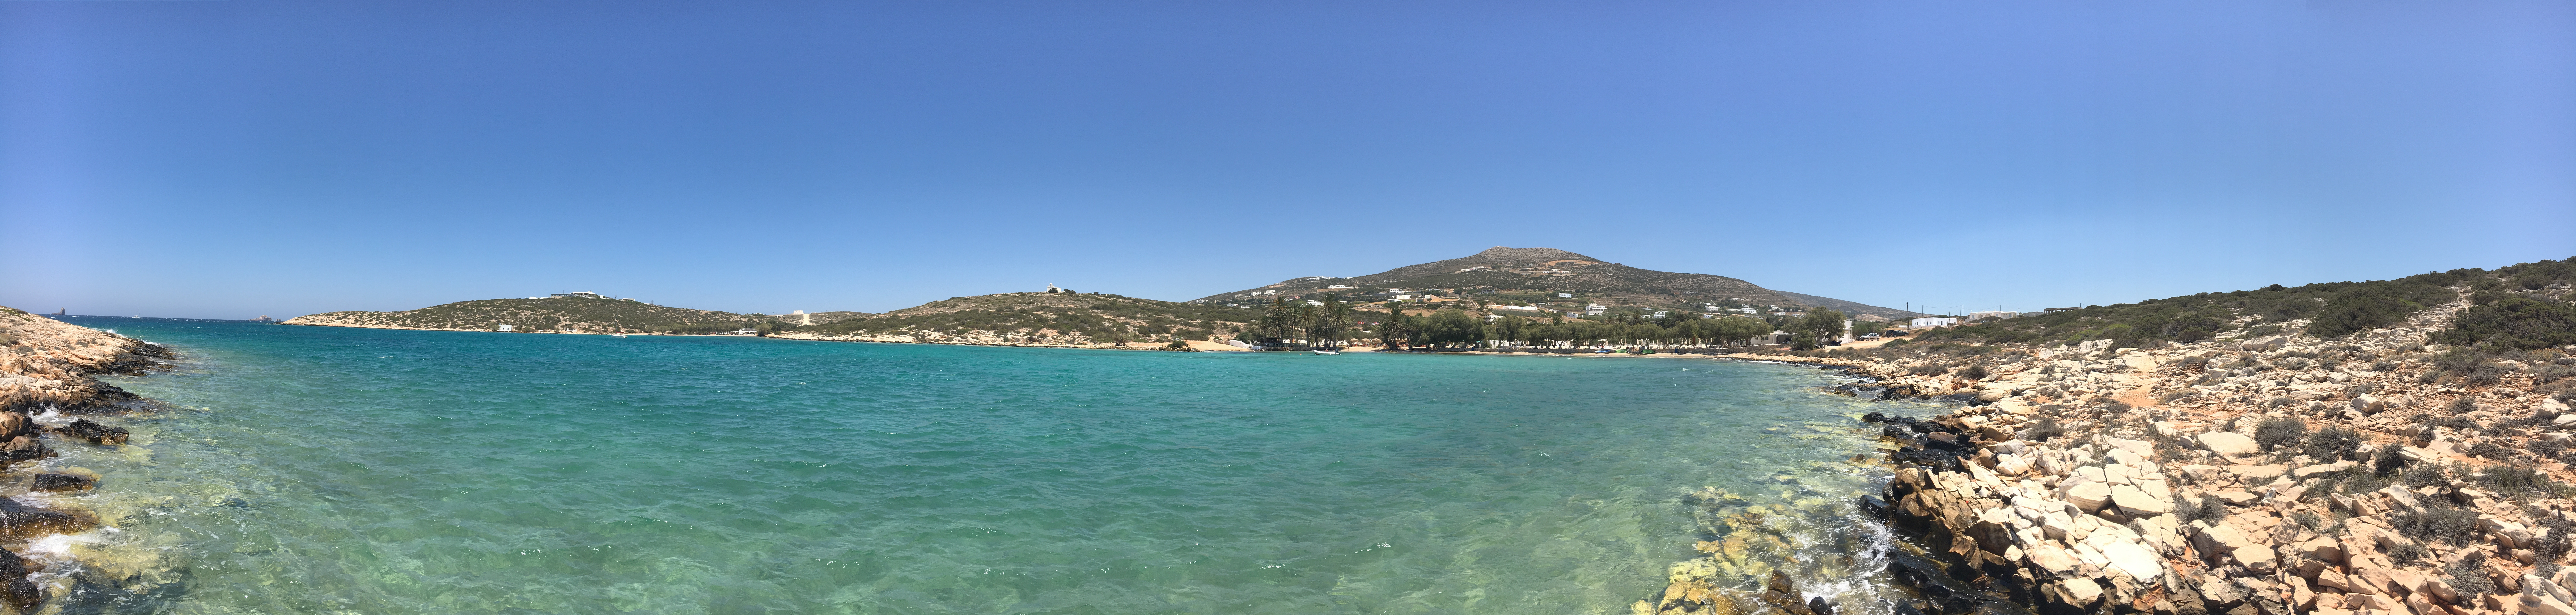 Paros, Îles Cyclades, Grèce